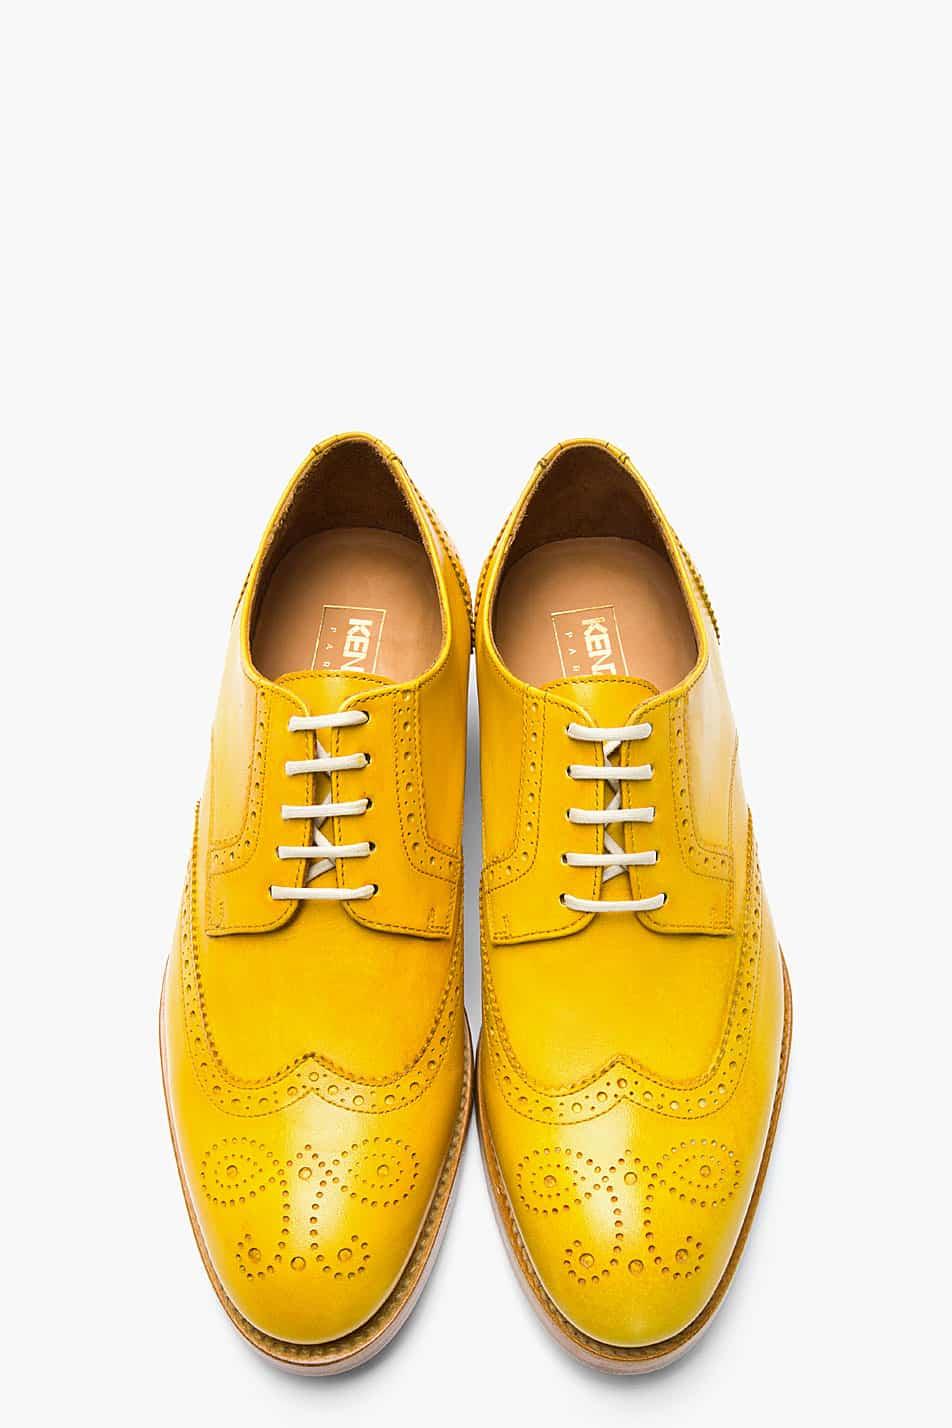 Mariage thème jaune curry 13